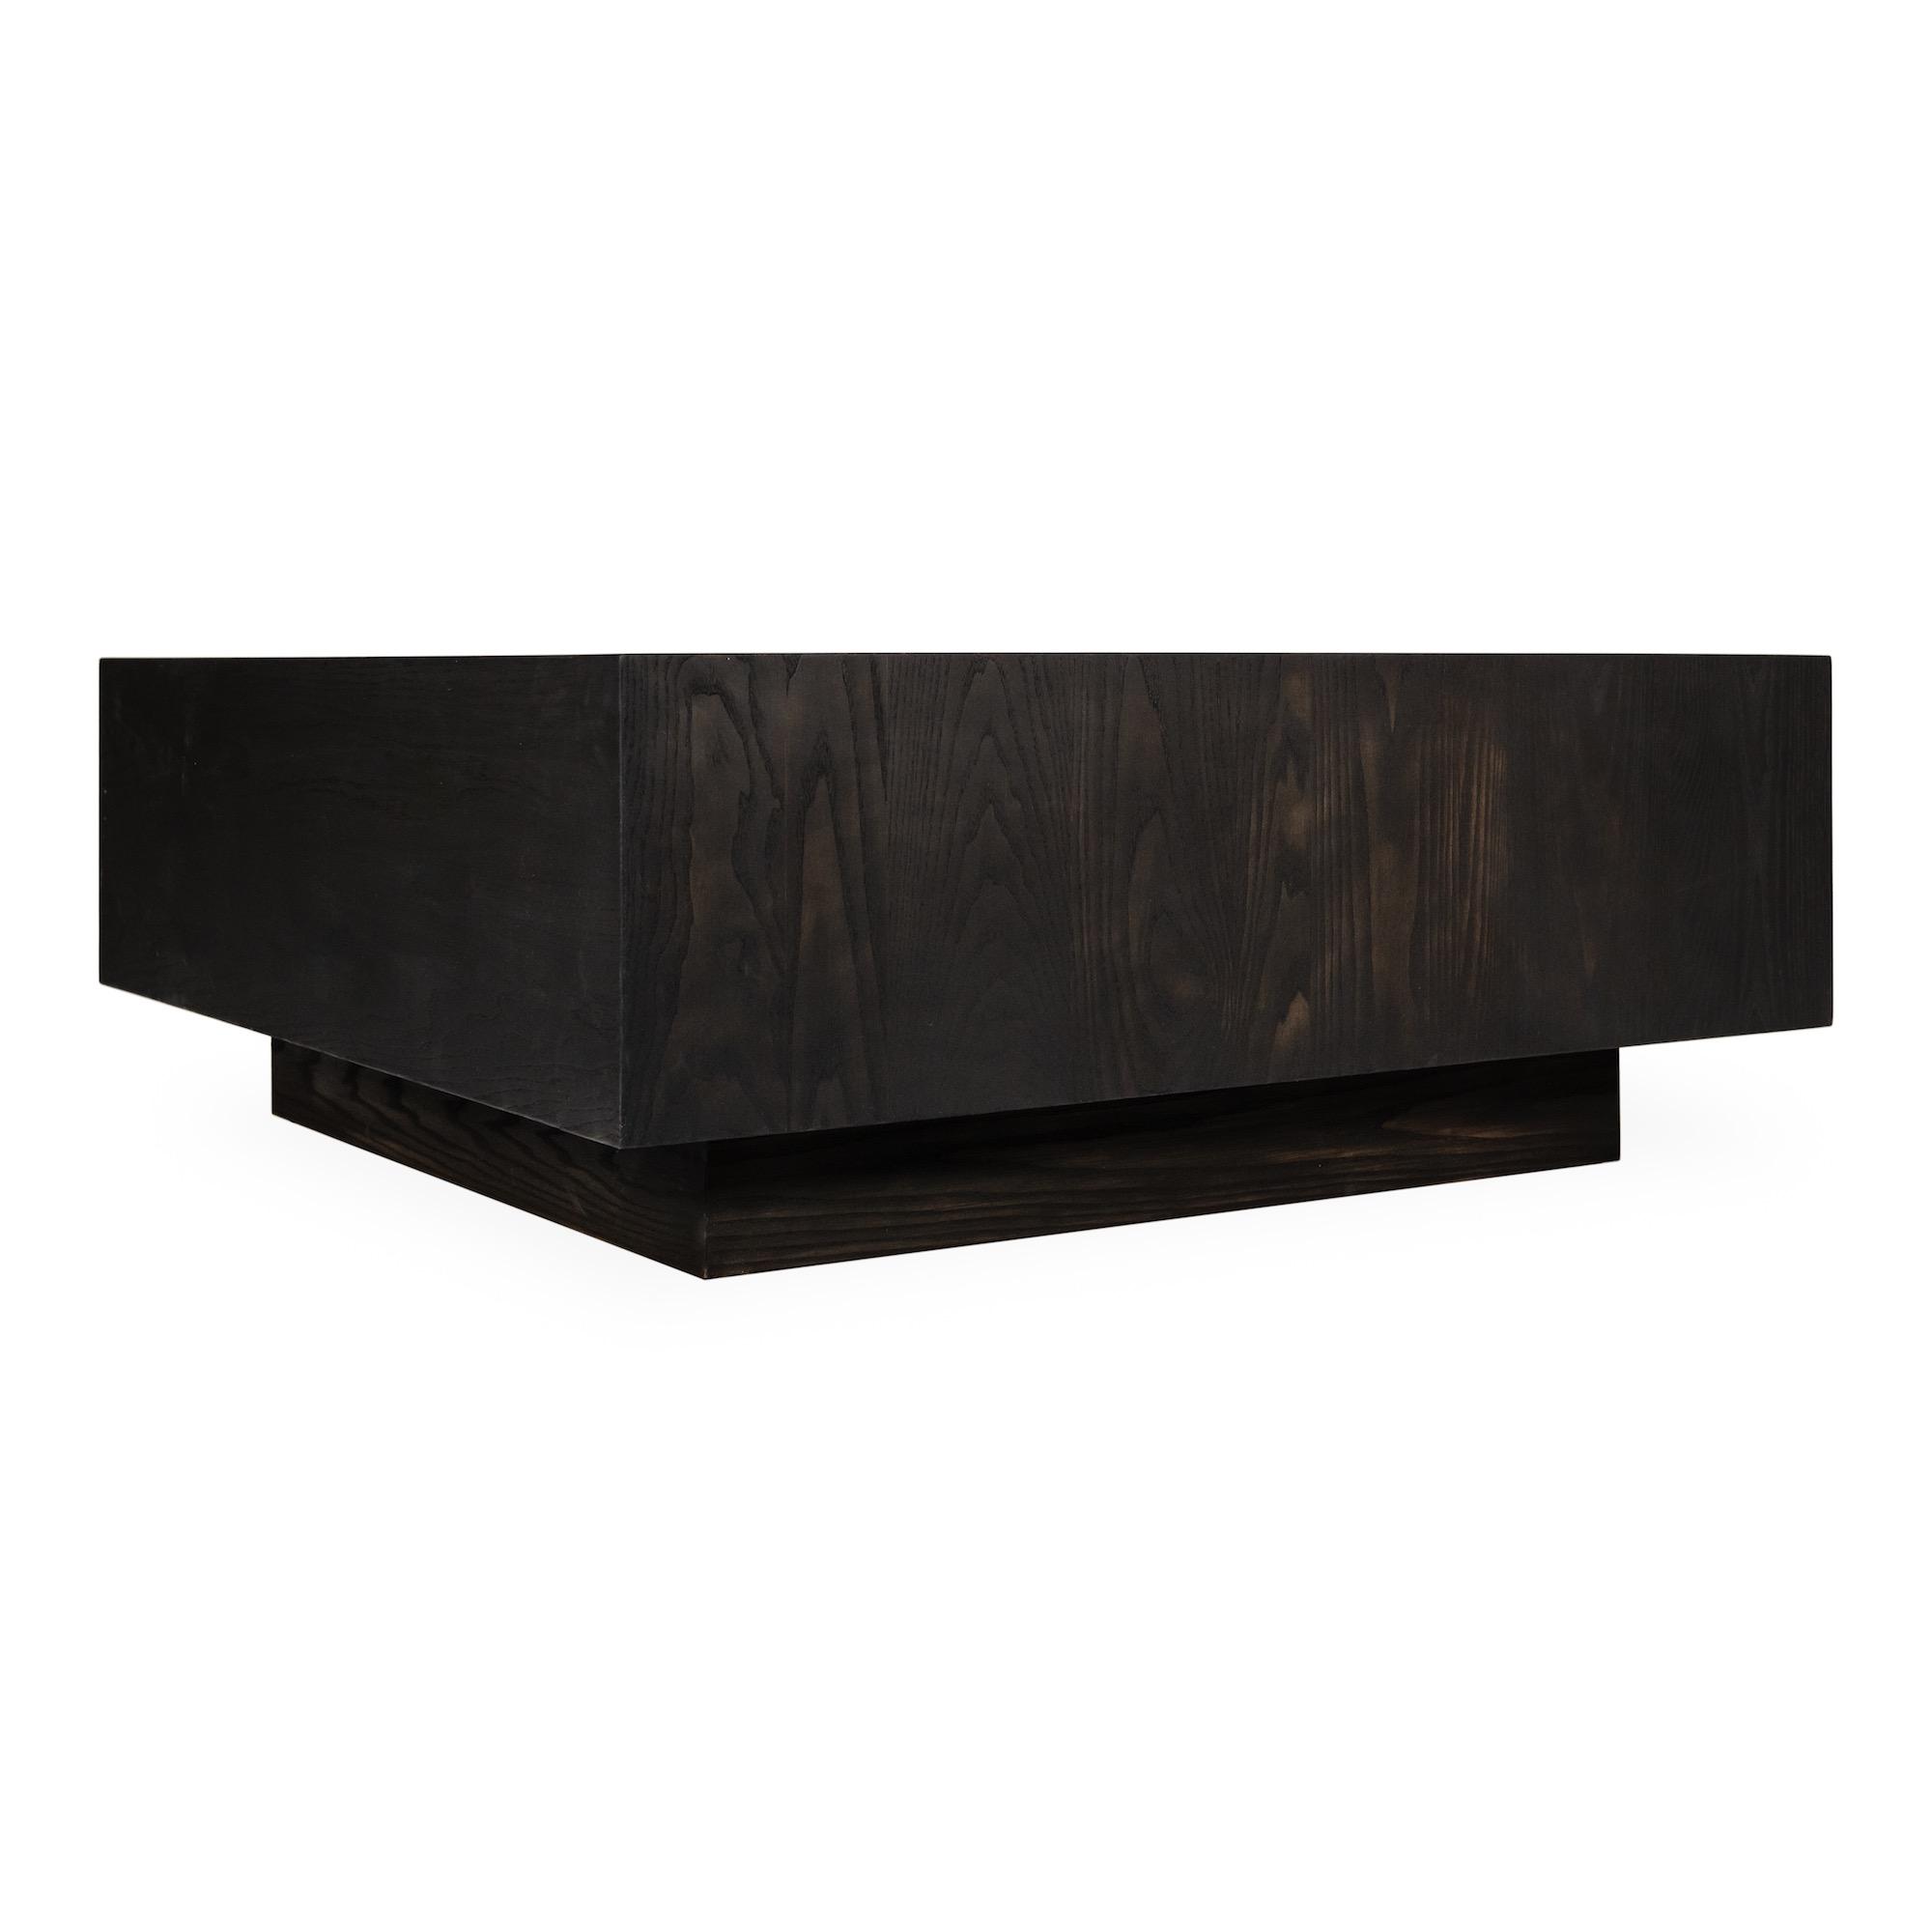 Woodcraft_Furniture_TofinoCoffeeTable-4